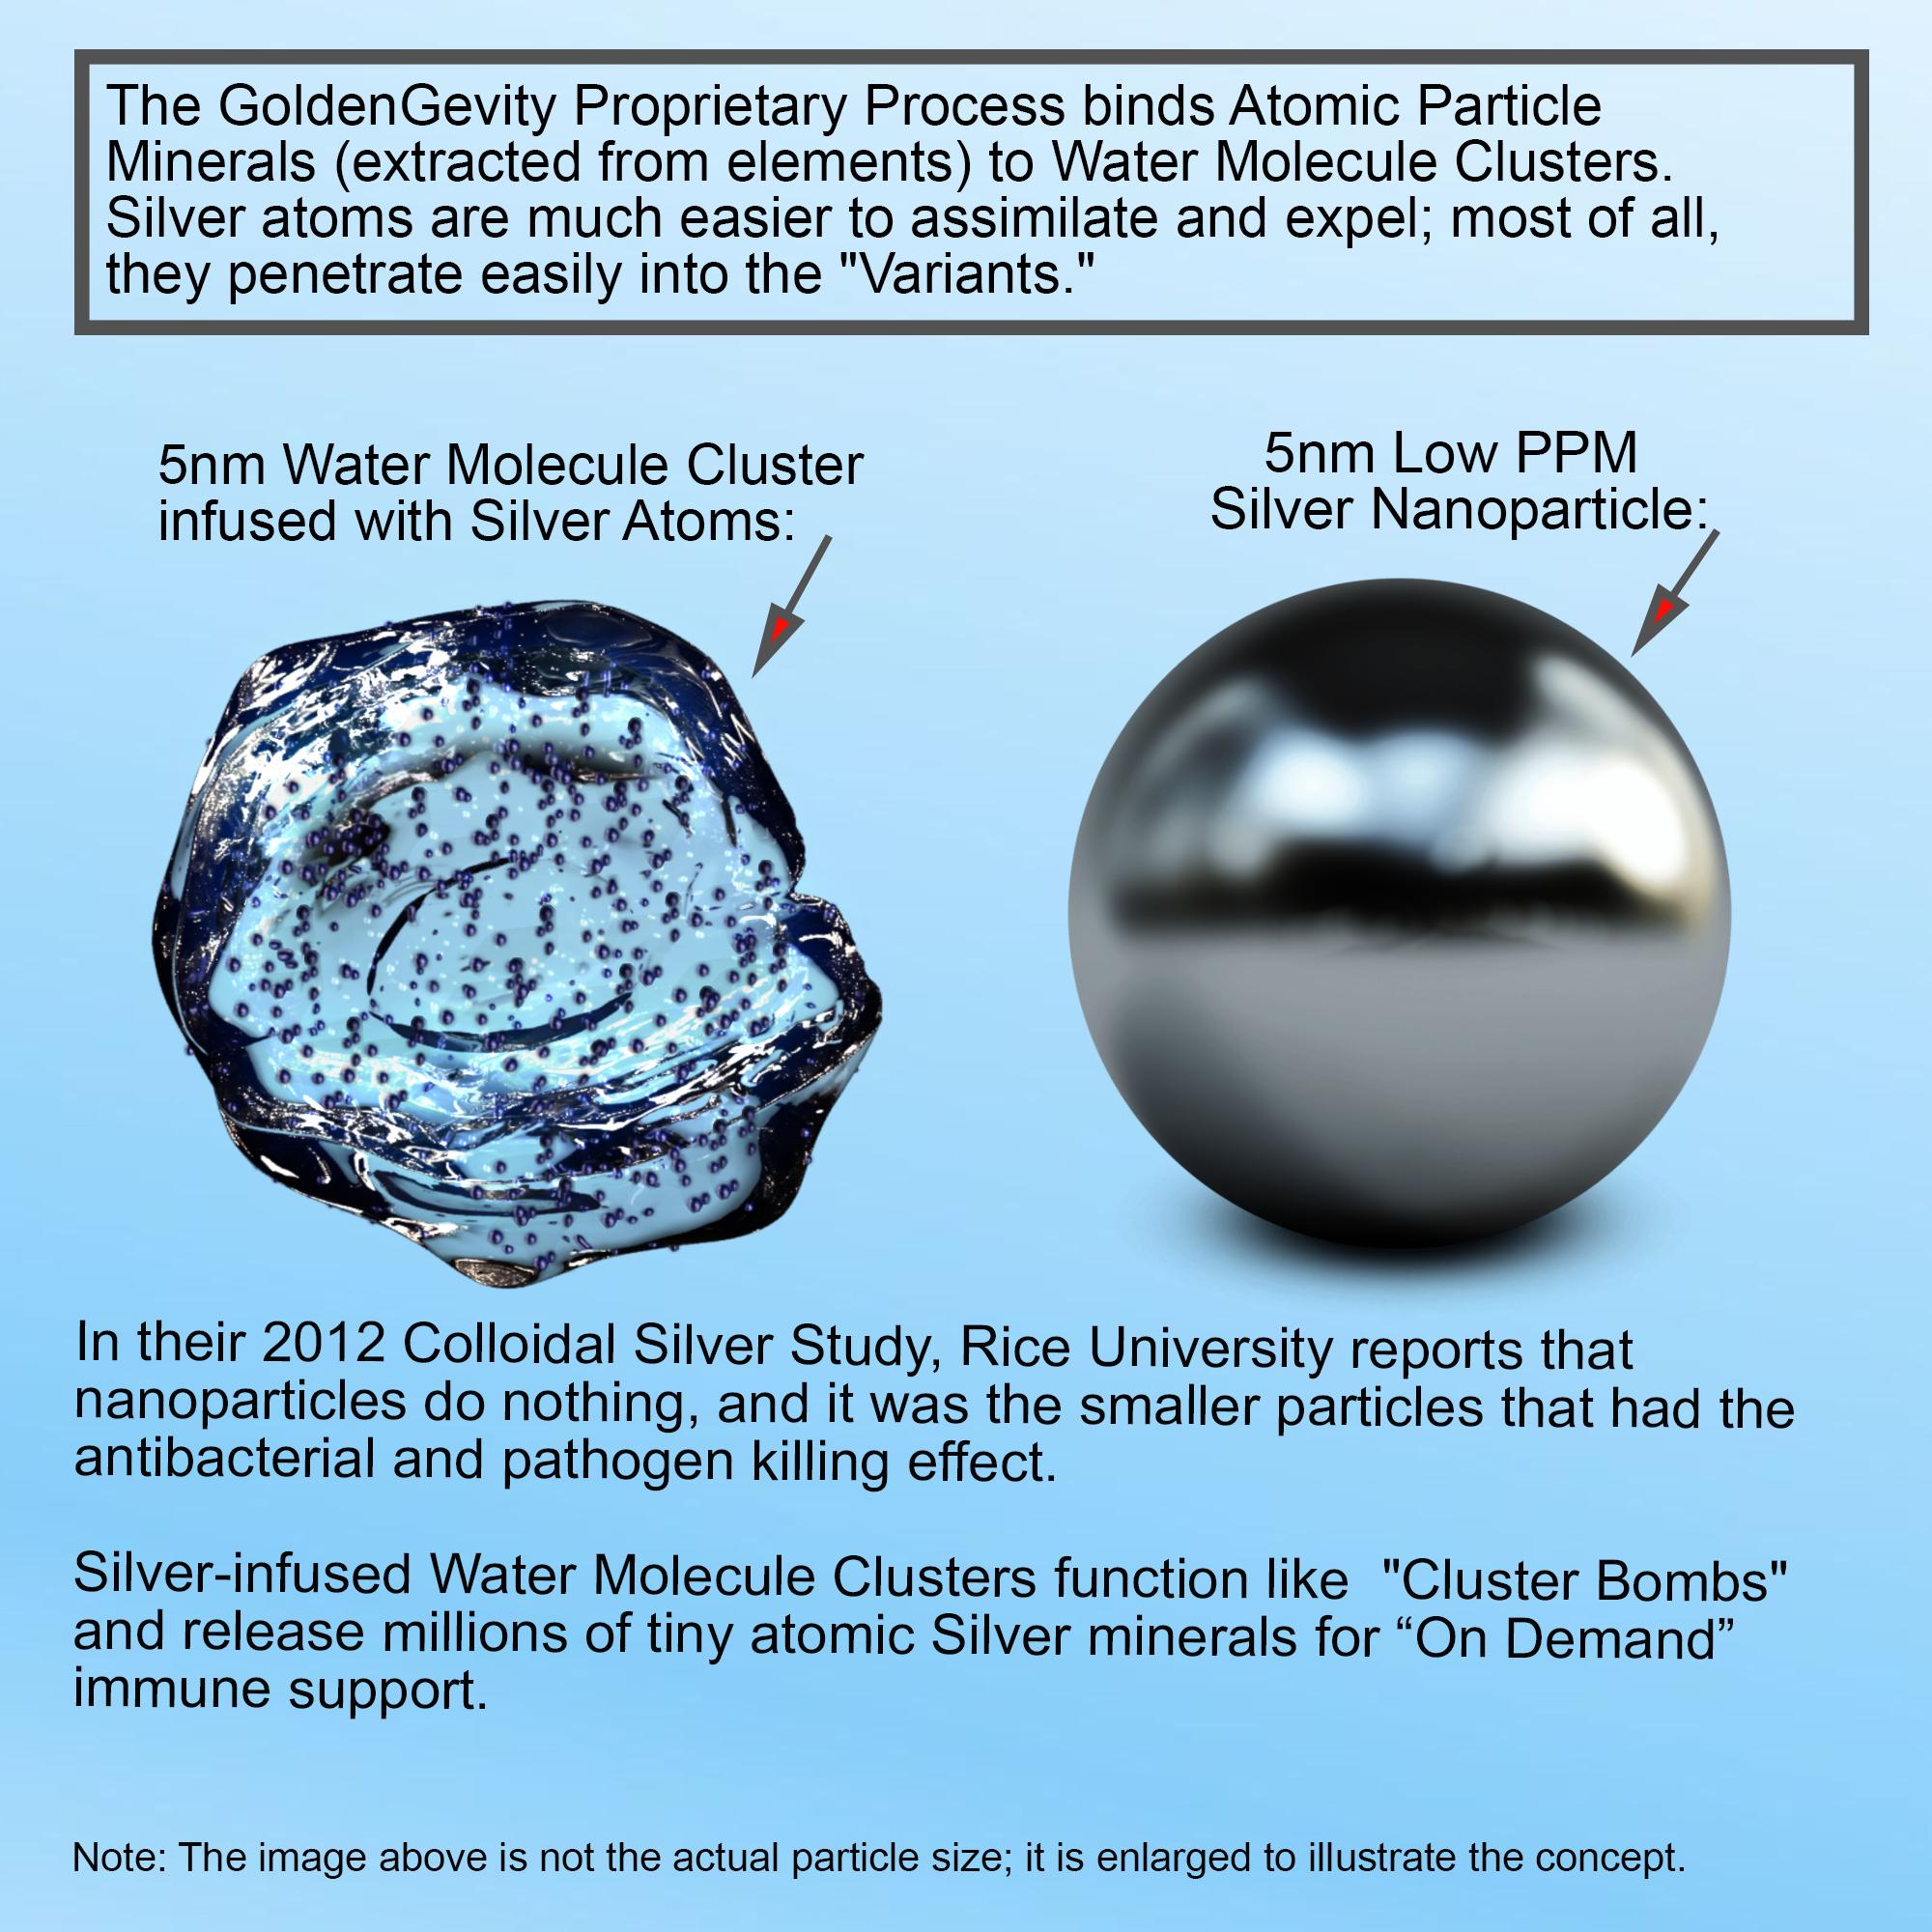 Silver-atomic-particles-vs-nanos.jpg